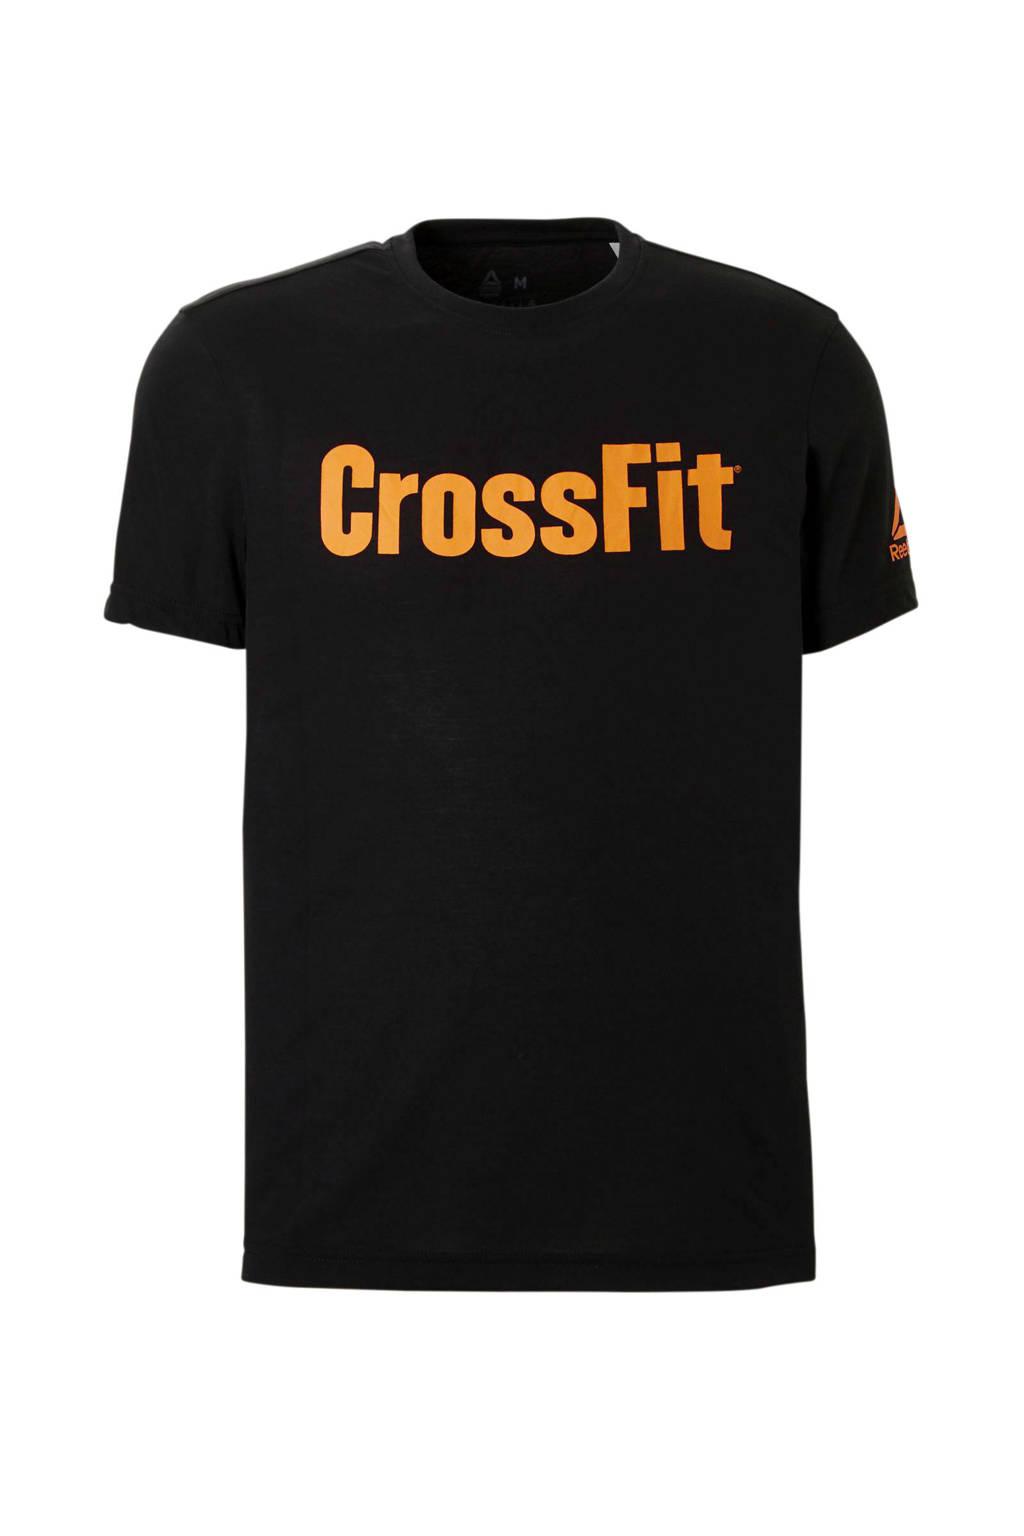 Reebok   CrossFit sport T-shirt zwart, Zwart/oranje